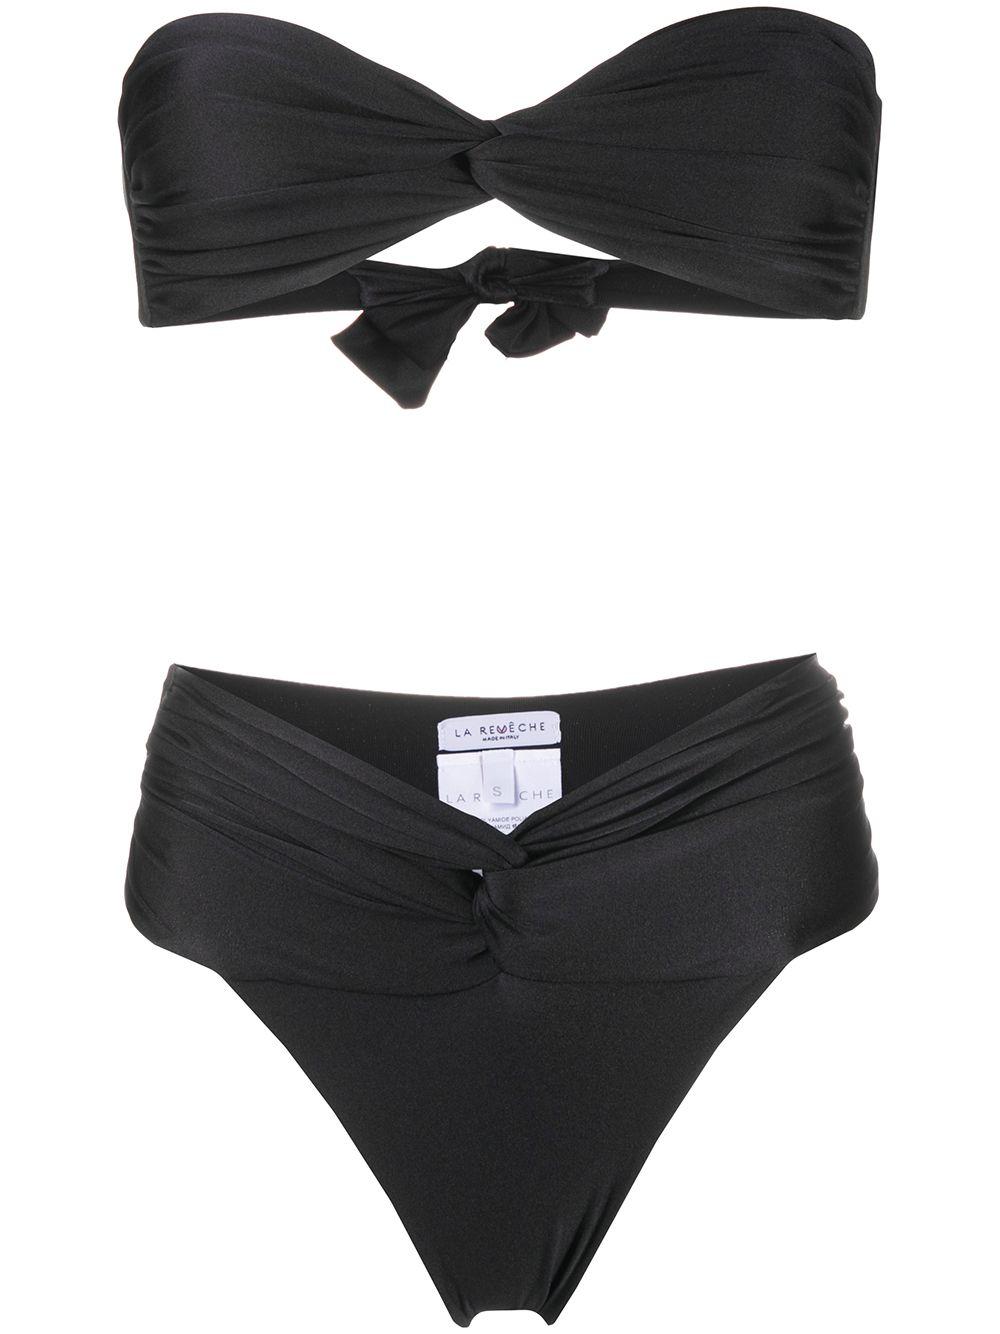 Black Amelie high-waisted bikini  LA REVECHE |  | AMELIEBLACK